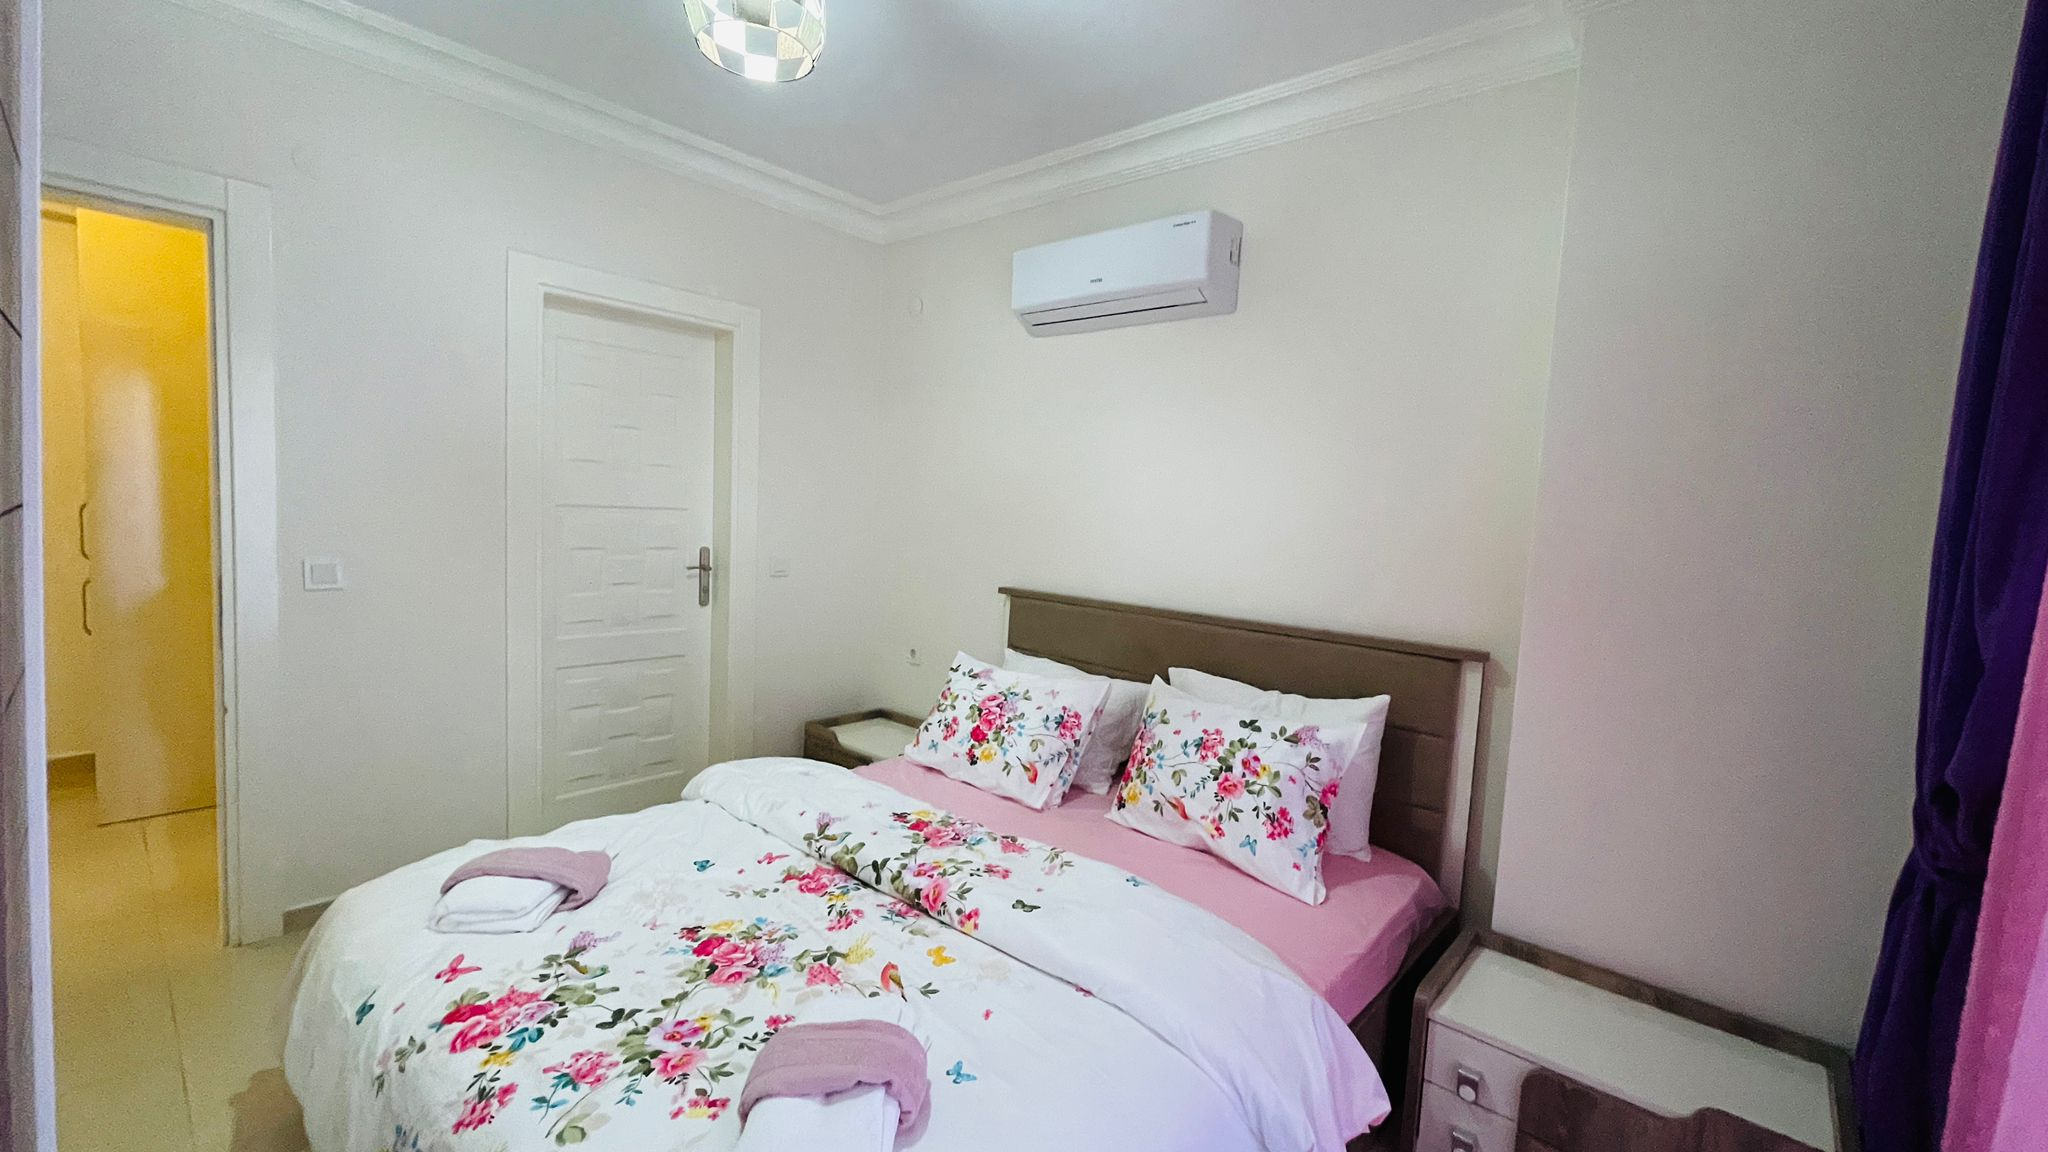 Меблированная квартира 2+1 в районе Махмутлар - Фото 16